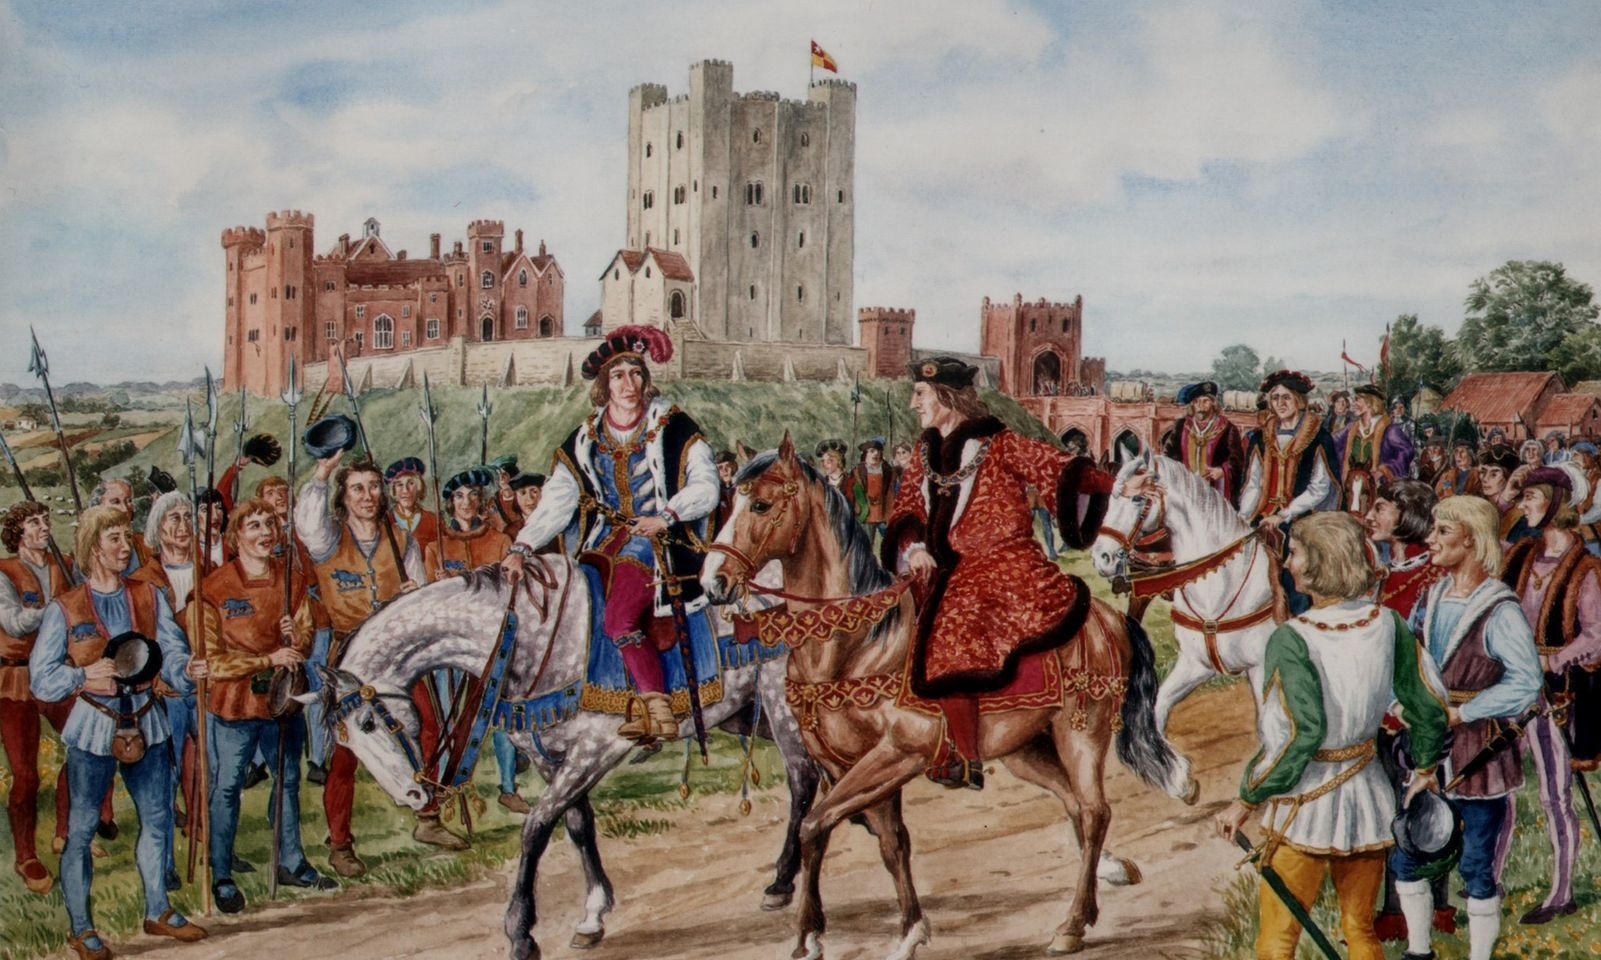 Hedingham's Tudor Castle Restoration Project